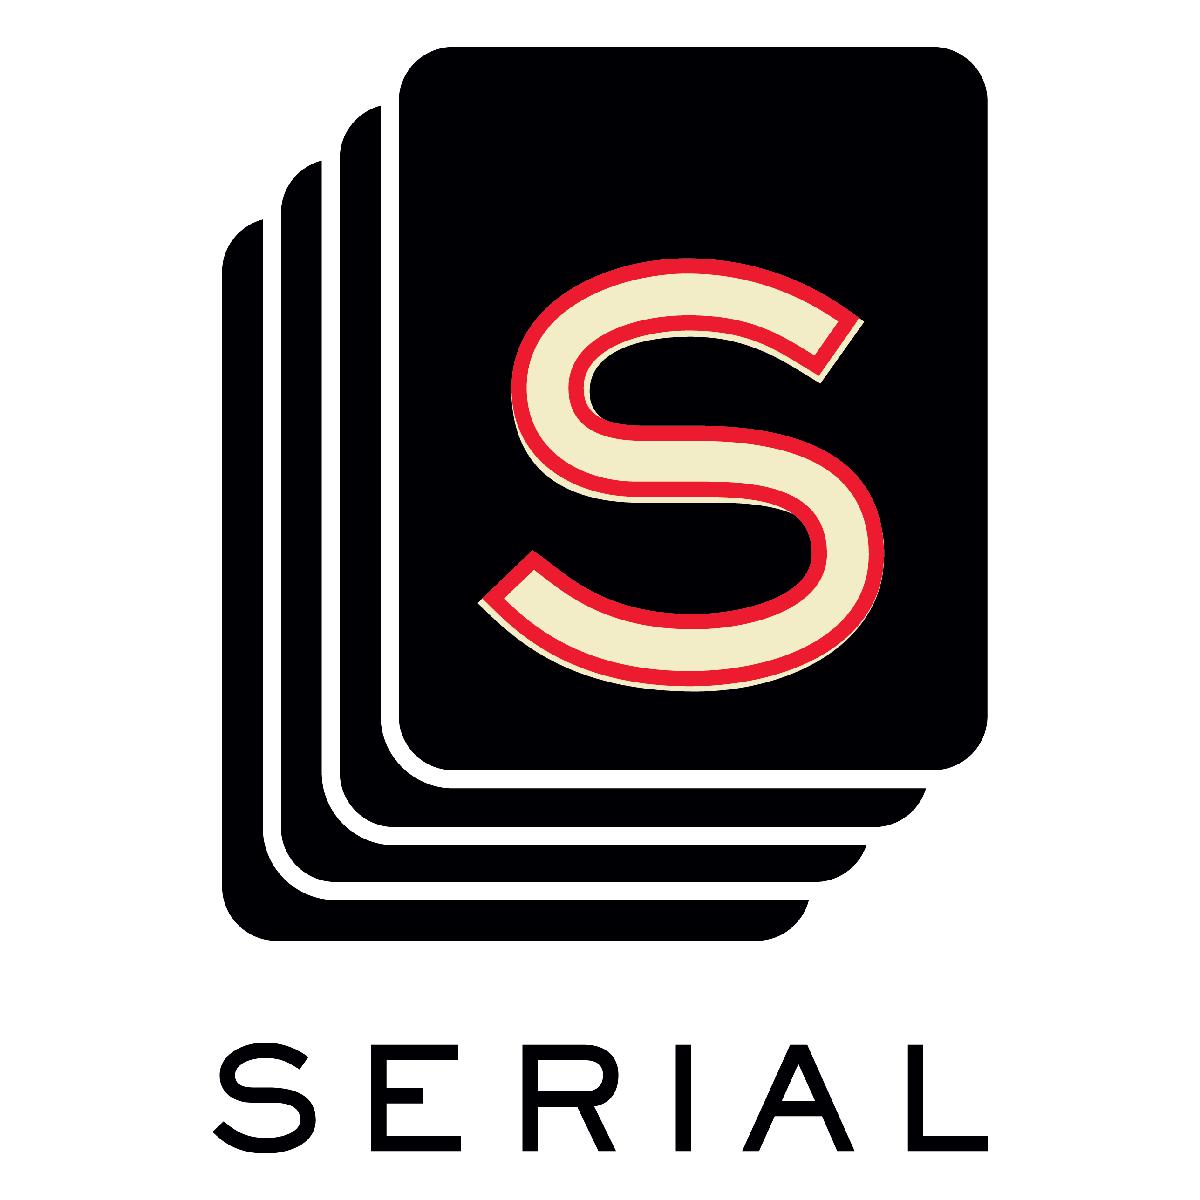 https://i1.wp.com/files.serialpodcast.org/sites/all/modules/custom/serial/img/serial-social-logo.png